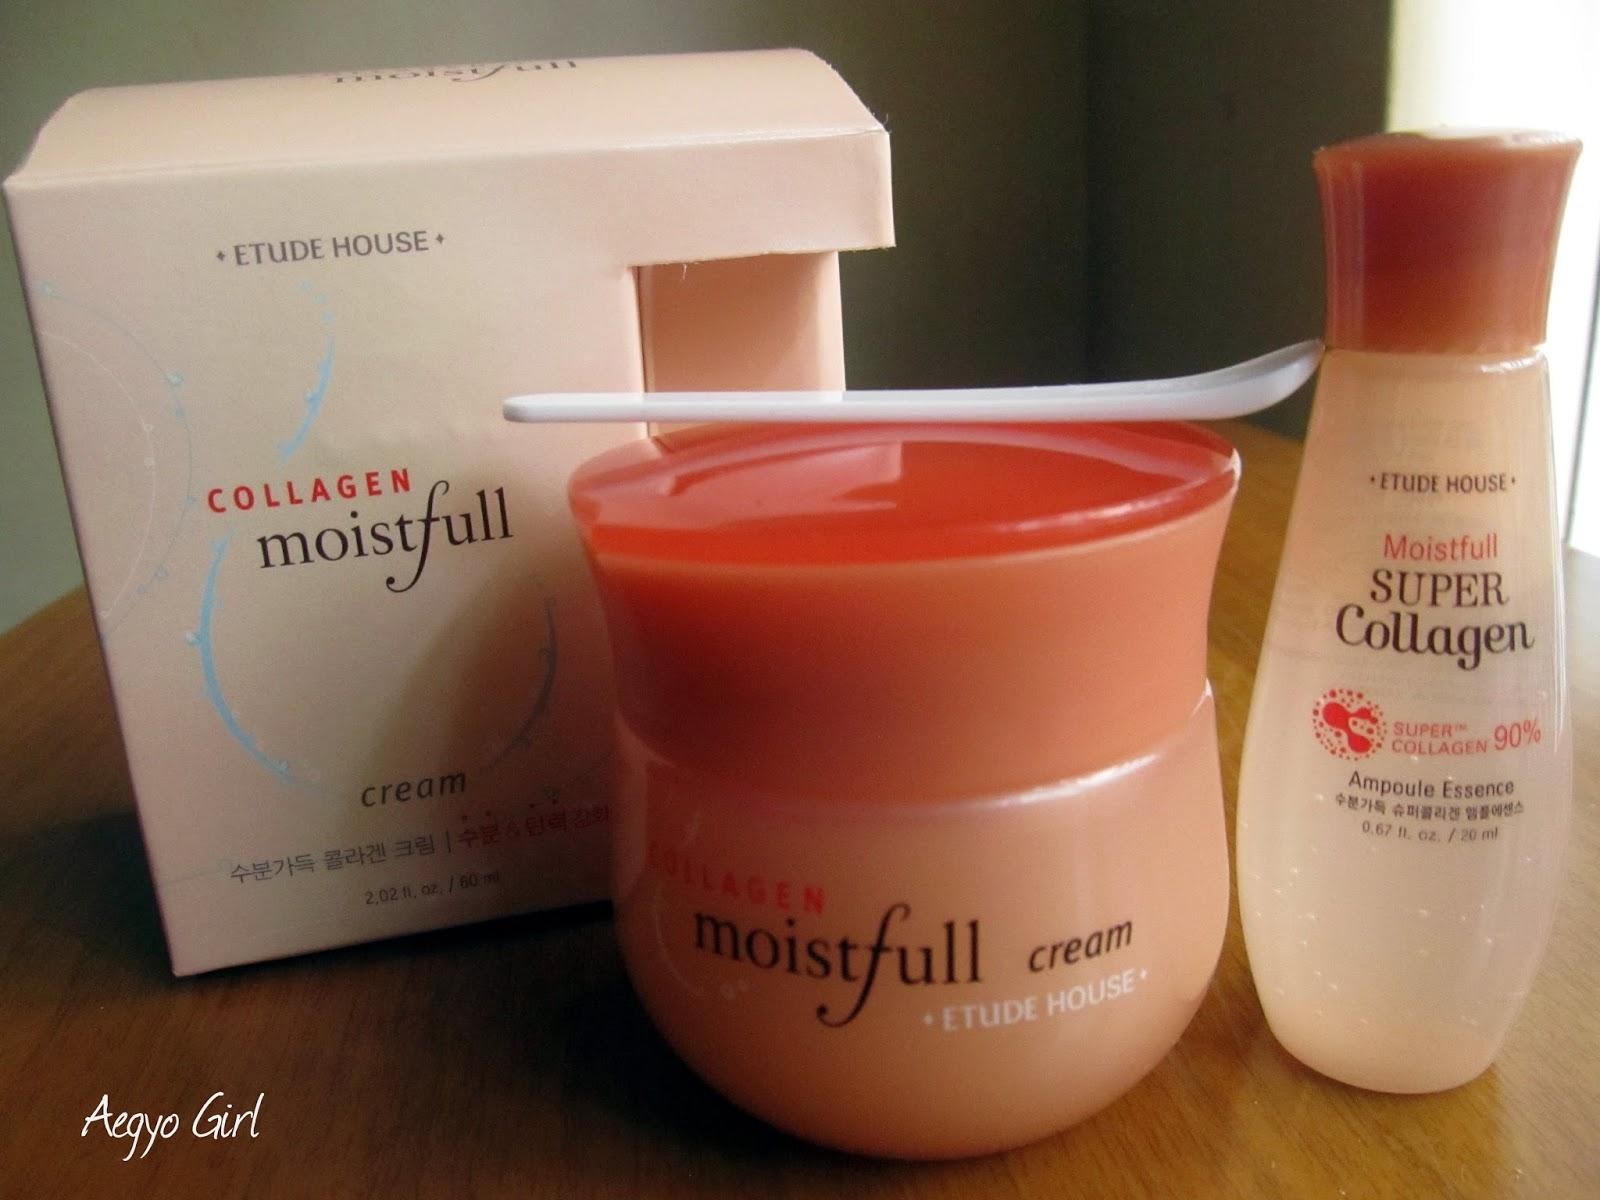 (6 Pack) ETUDE HOUSE Moistfull Collagen Cream , Fade Cream for Dark Spots, Normal Skin, 2 Oz - Pack of 2 By AMBI